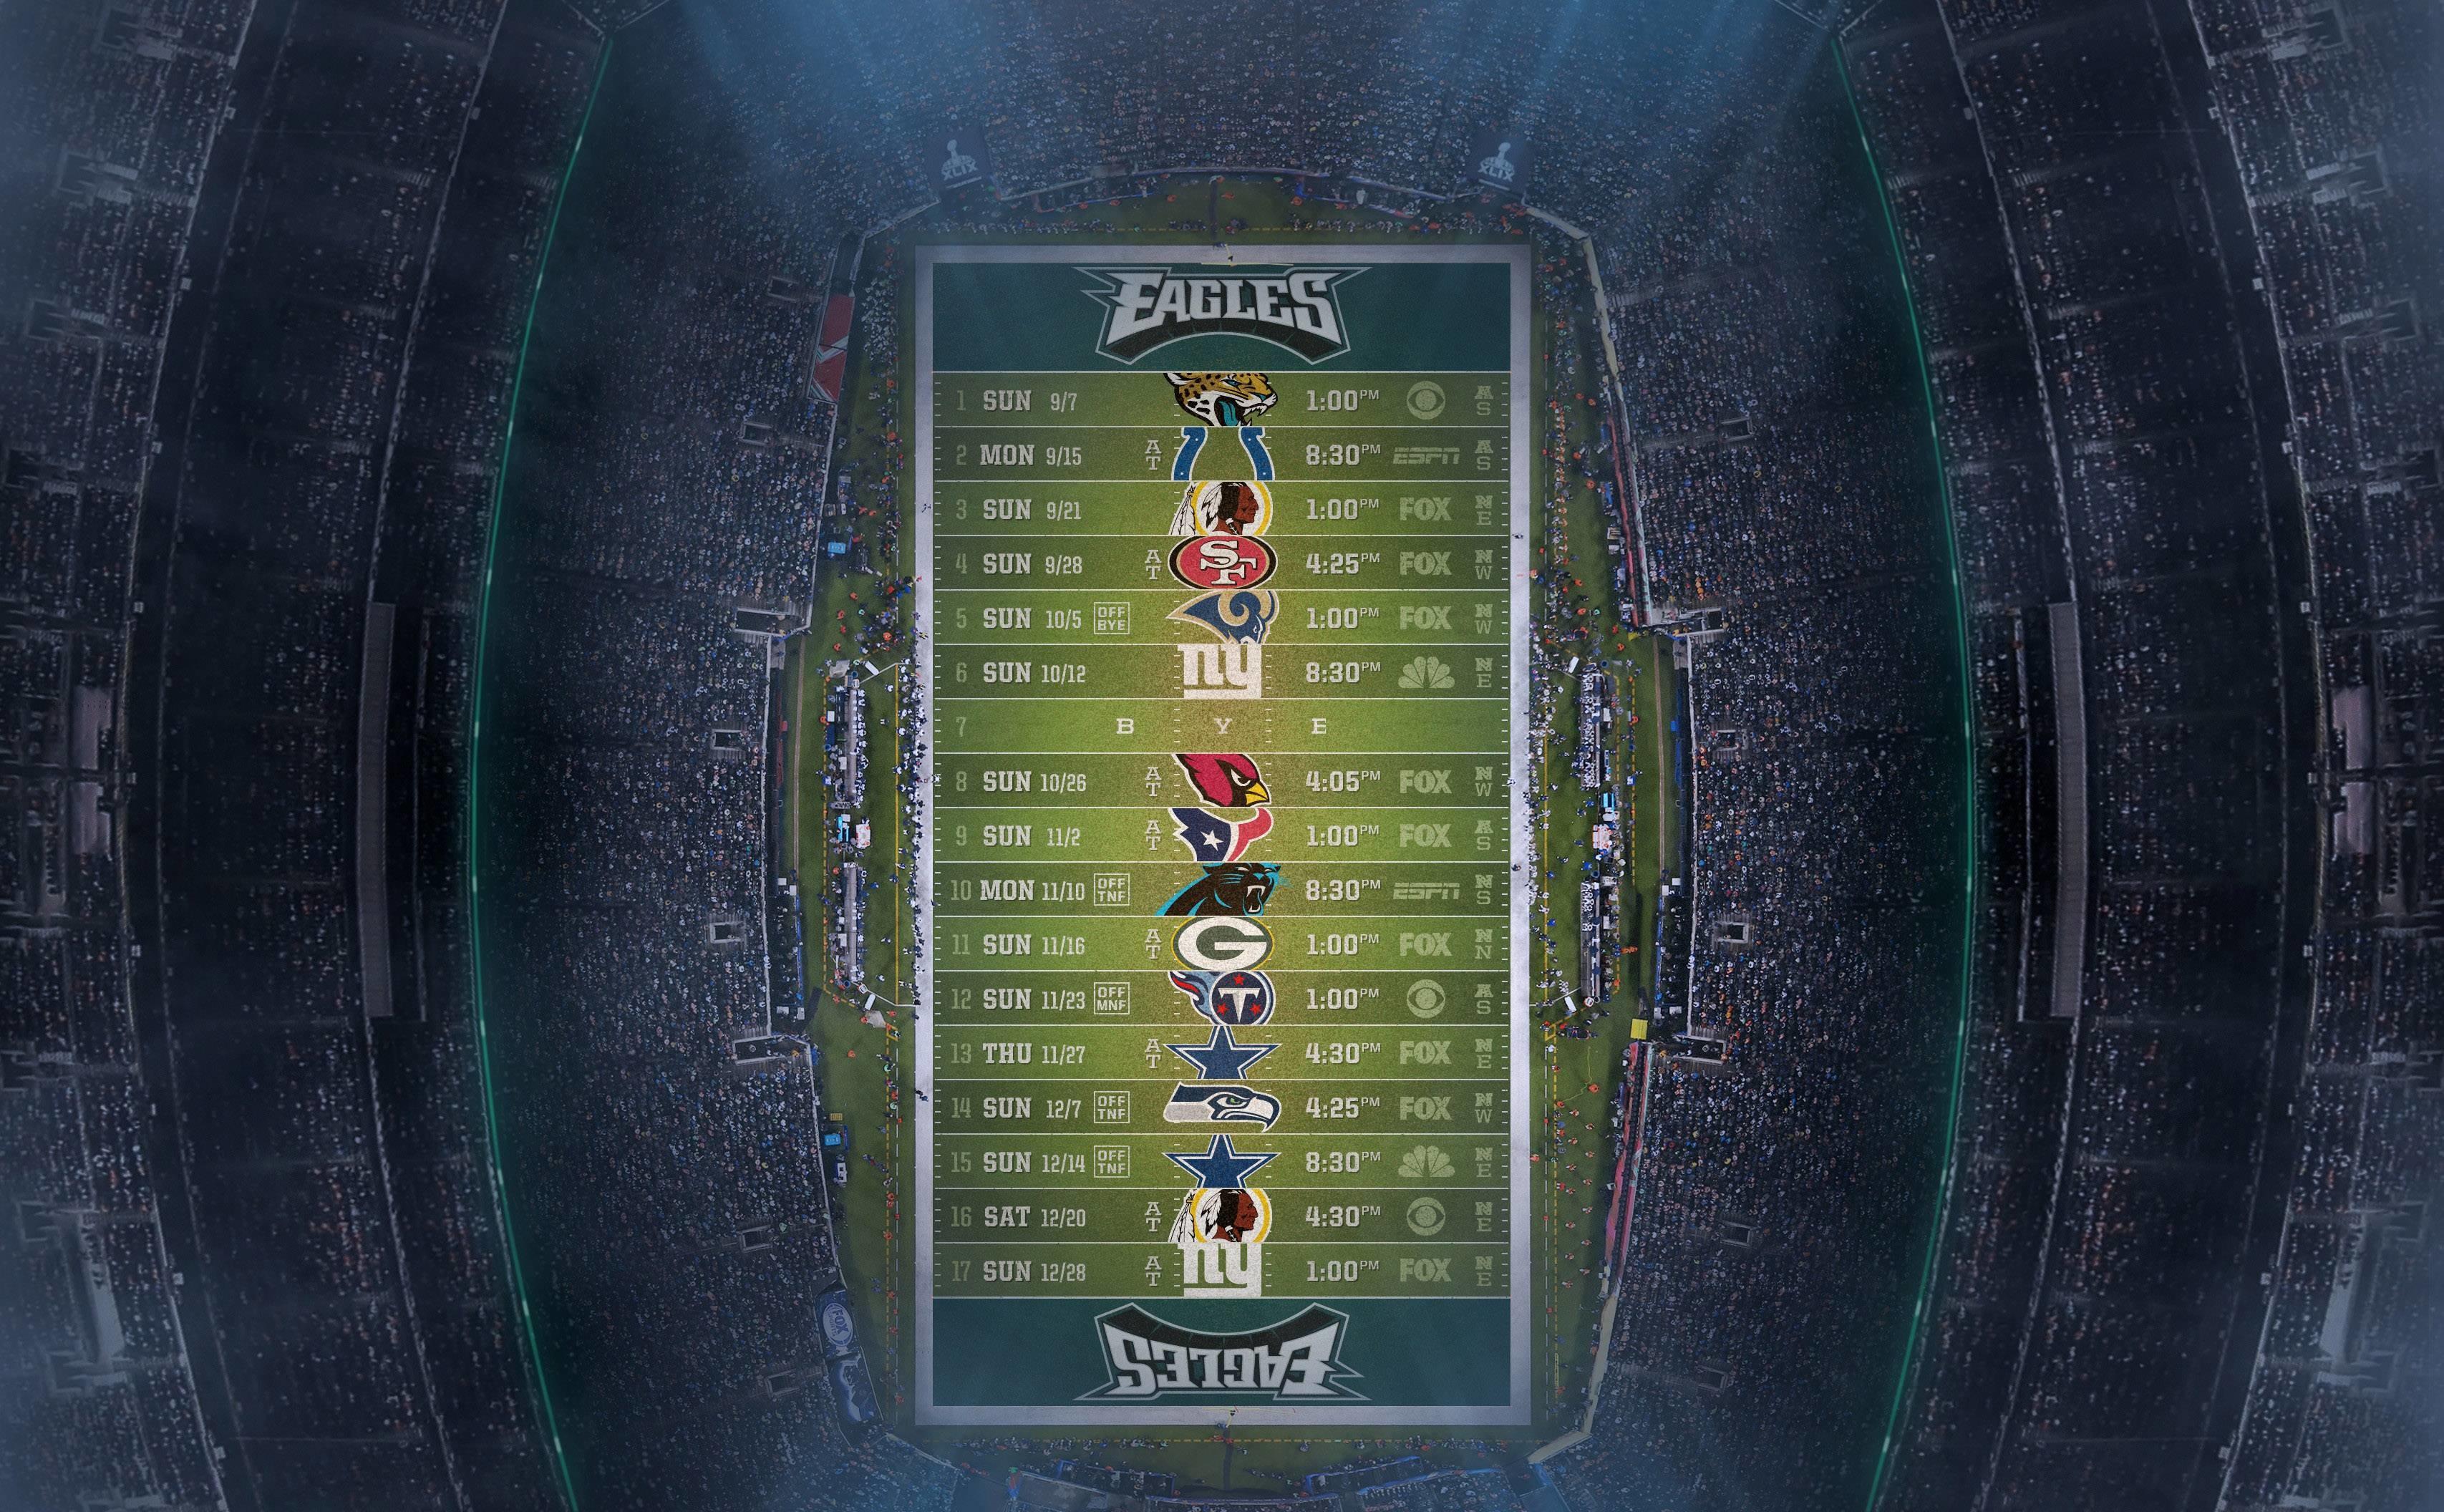 Philadelphia Eagles 2015 Schedule Wallpapers – Wallpaper Cave